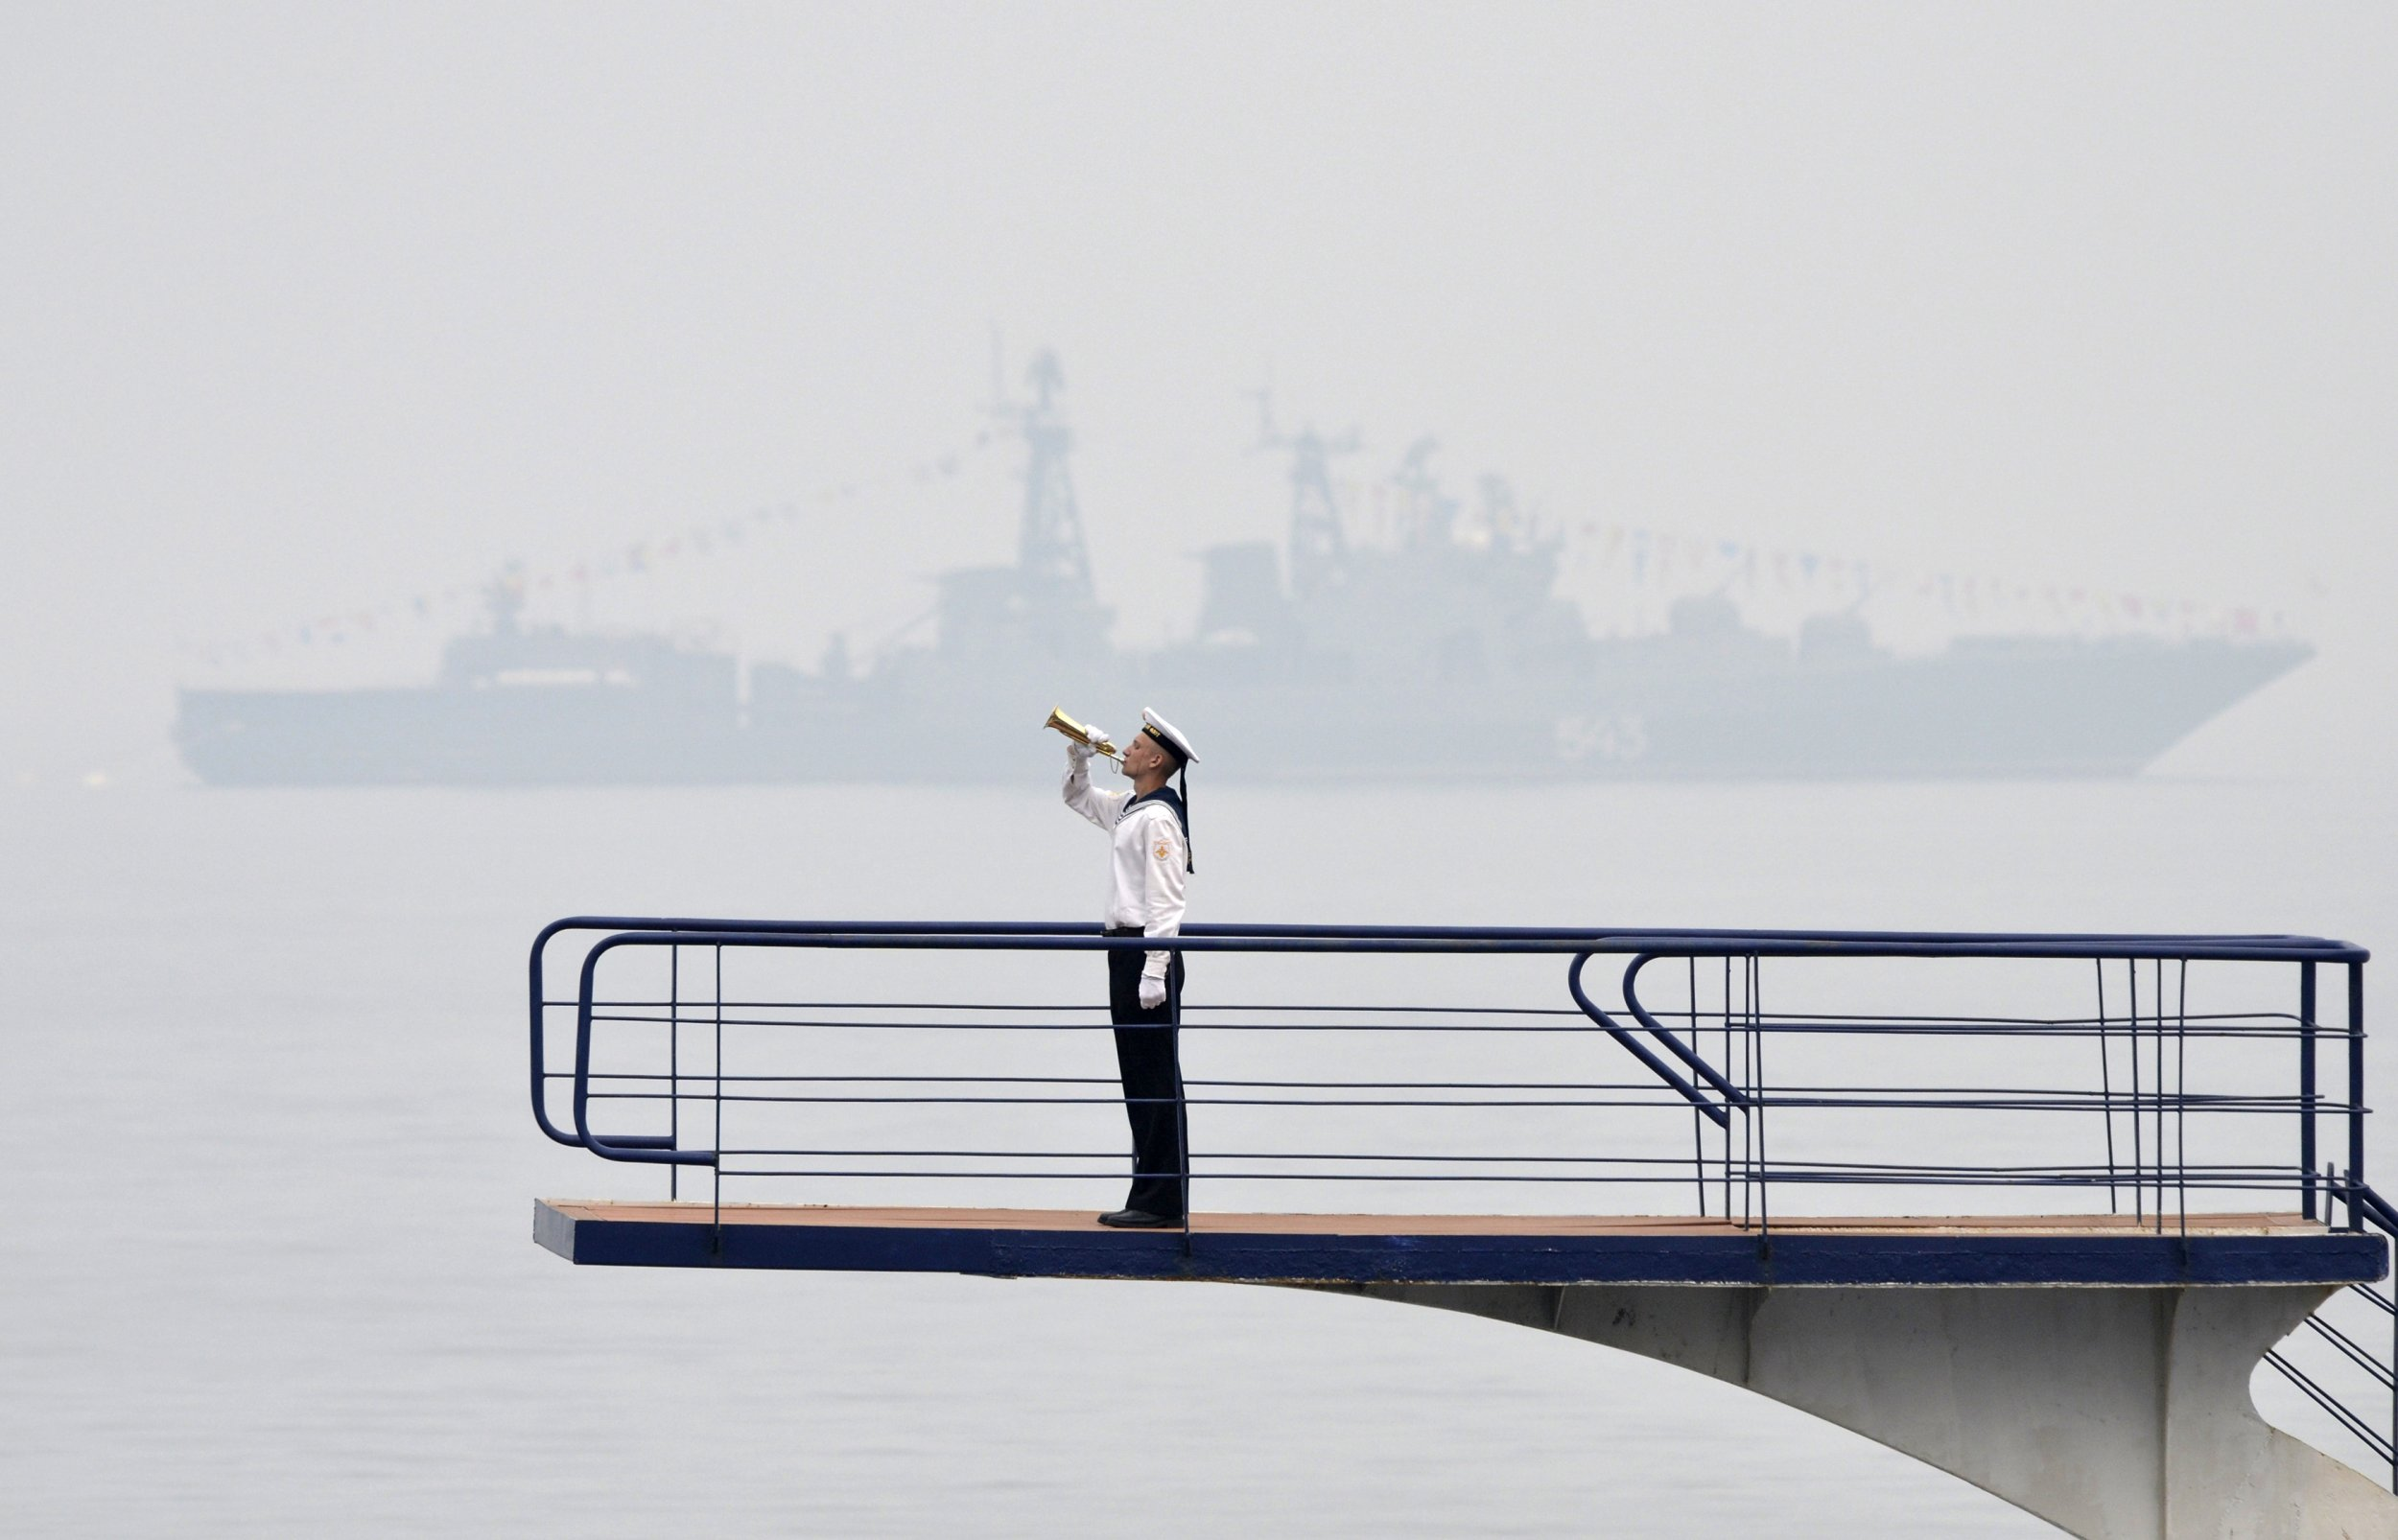 Russian sailor